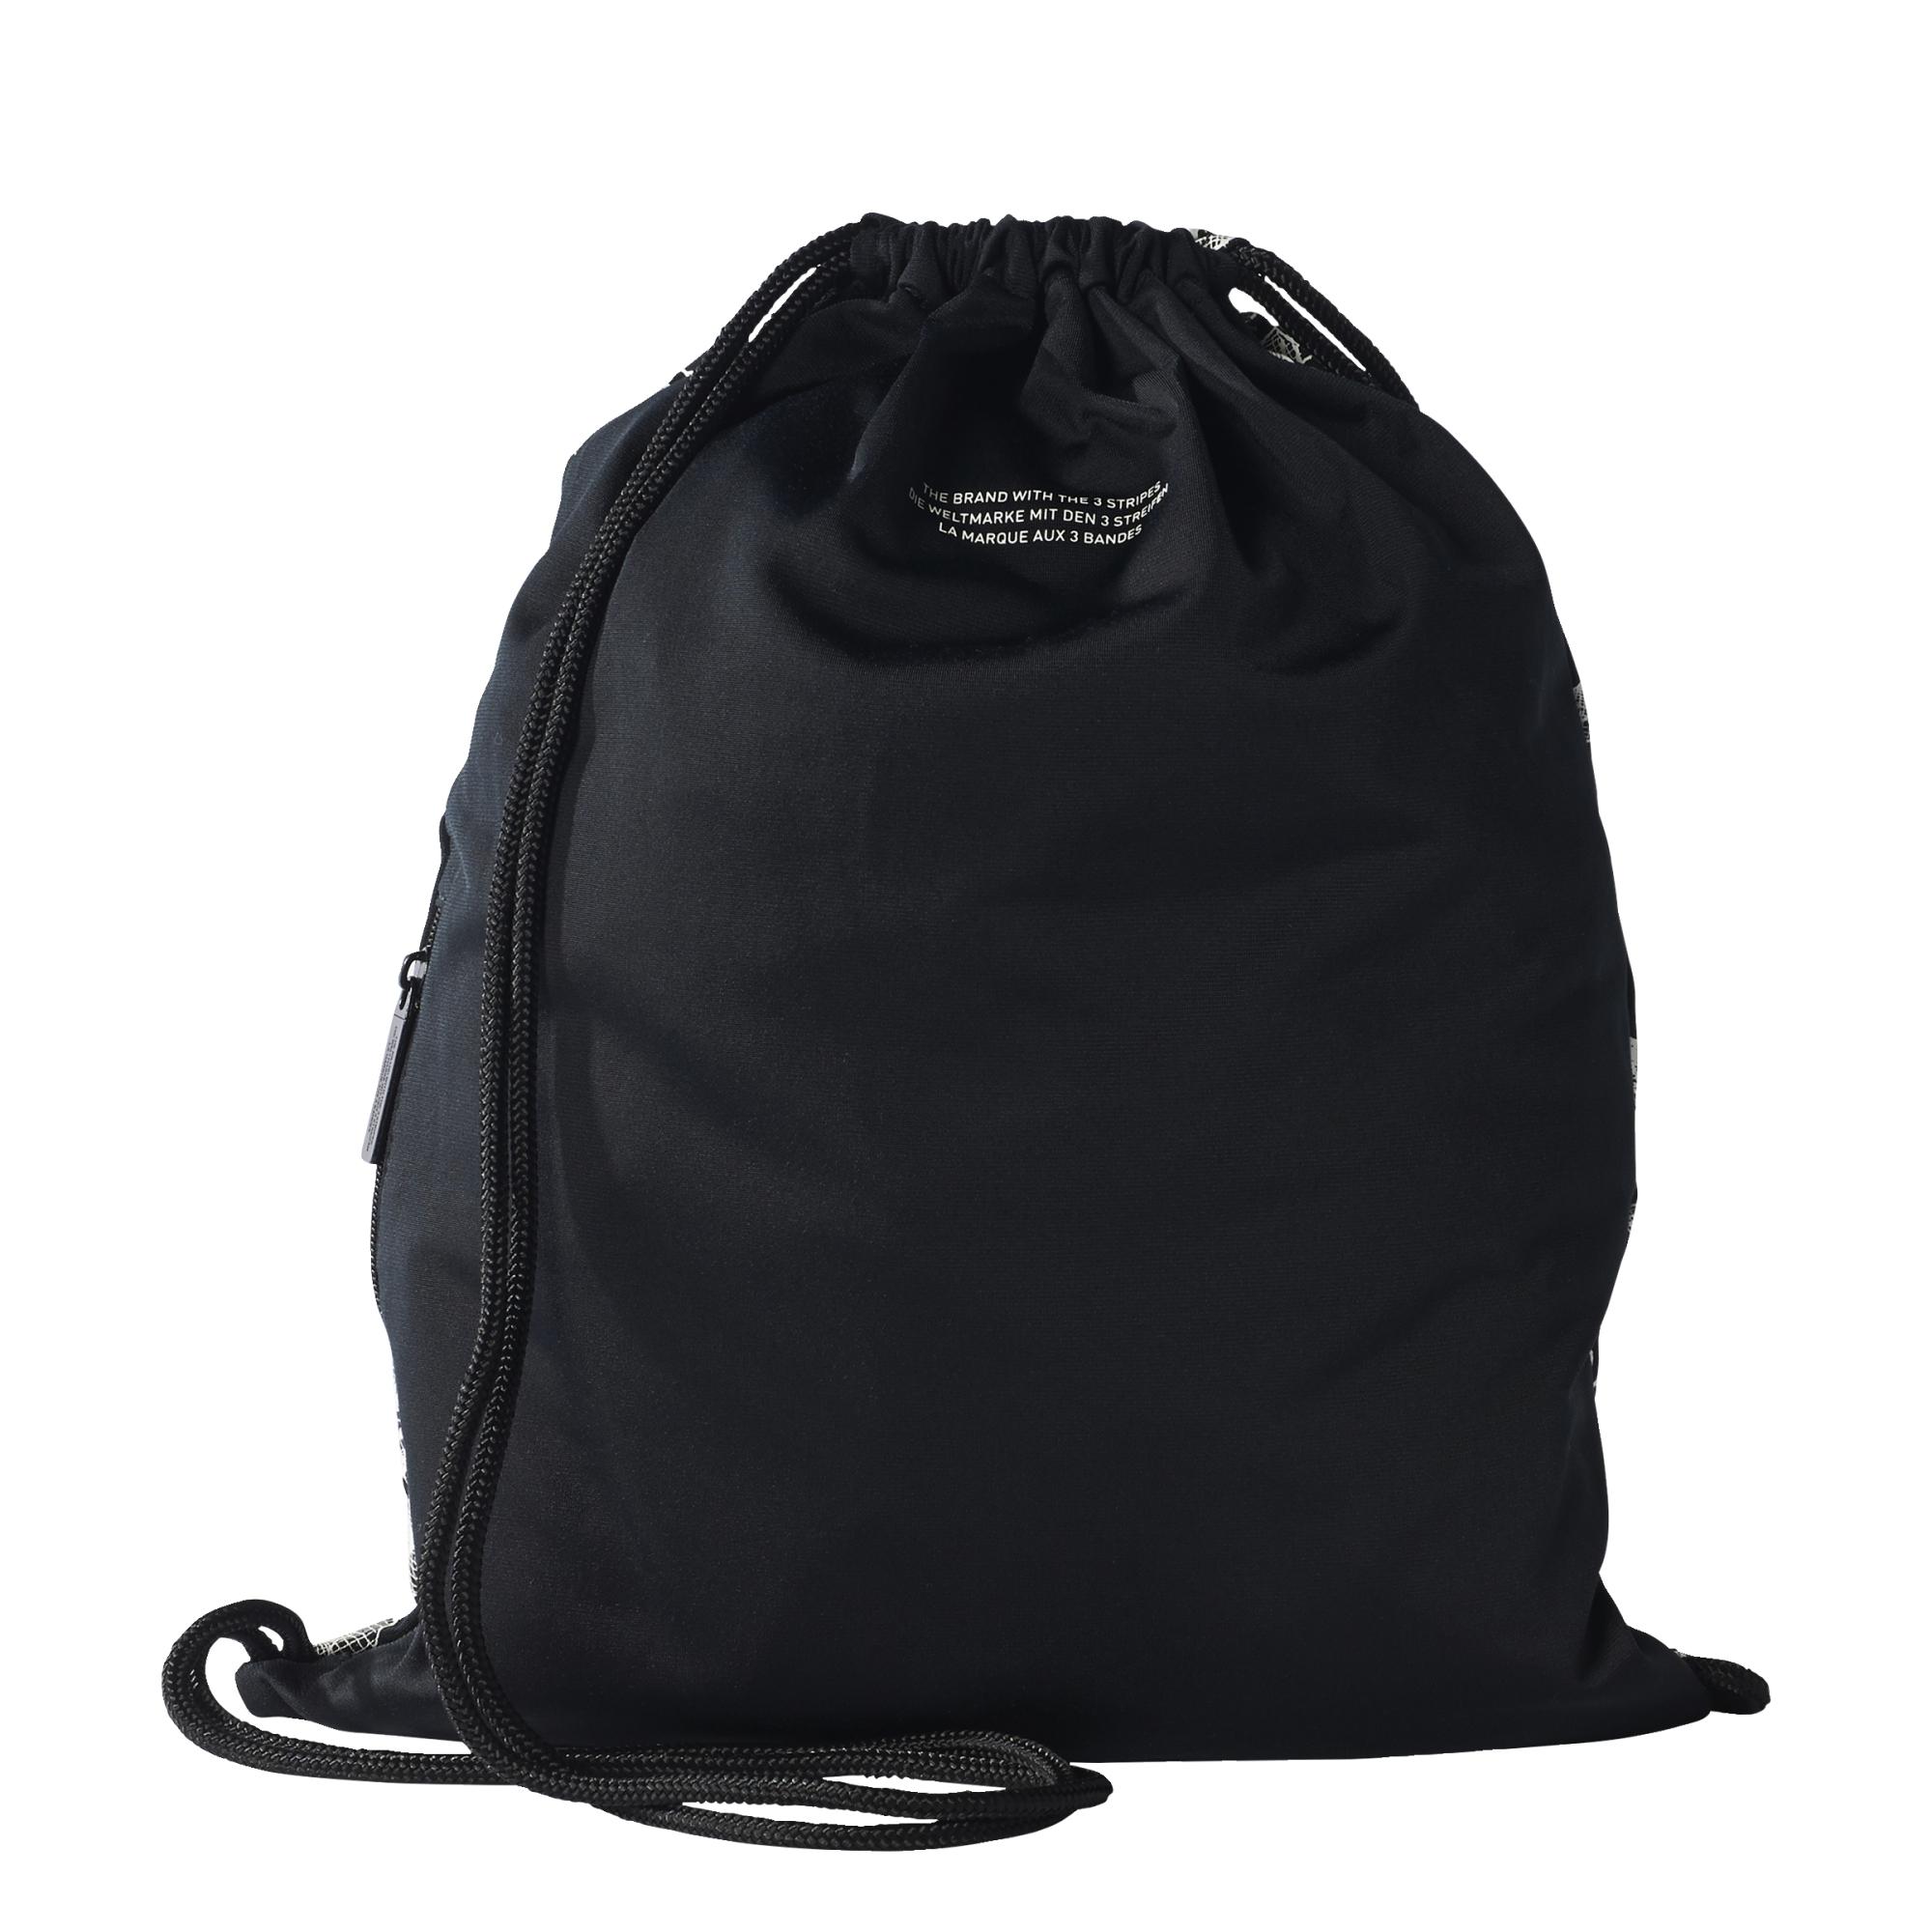 Adidas Originals Giza Gymsack (black white) 9bcb04f818b